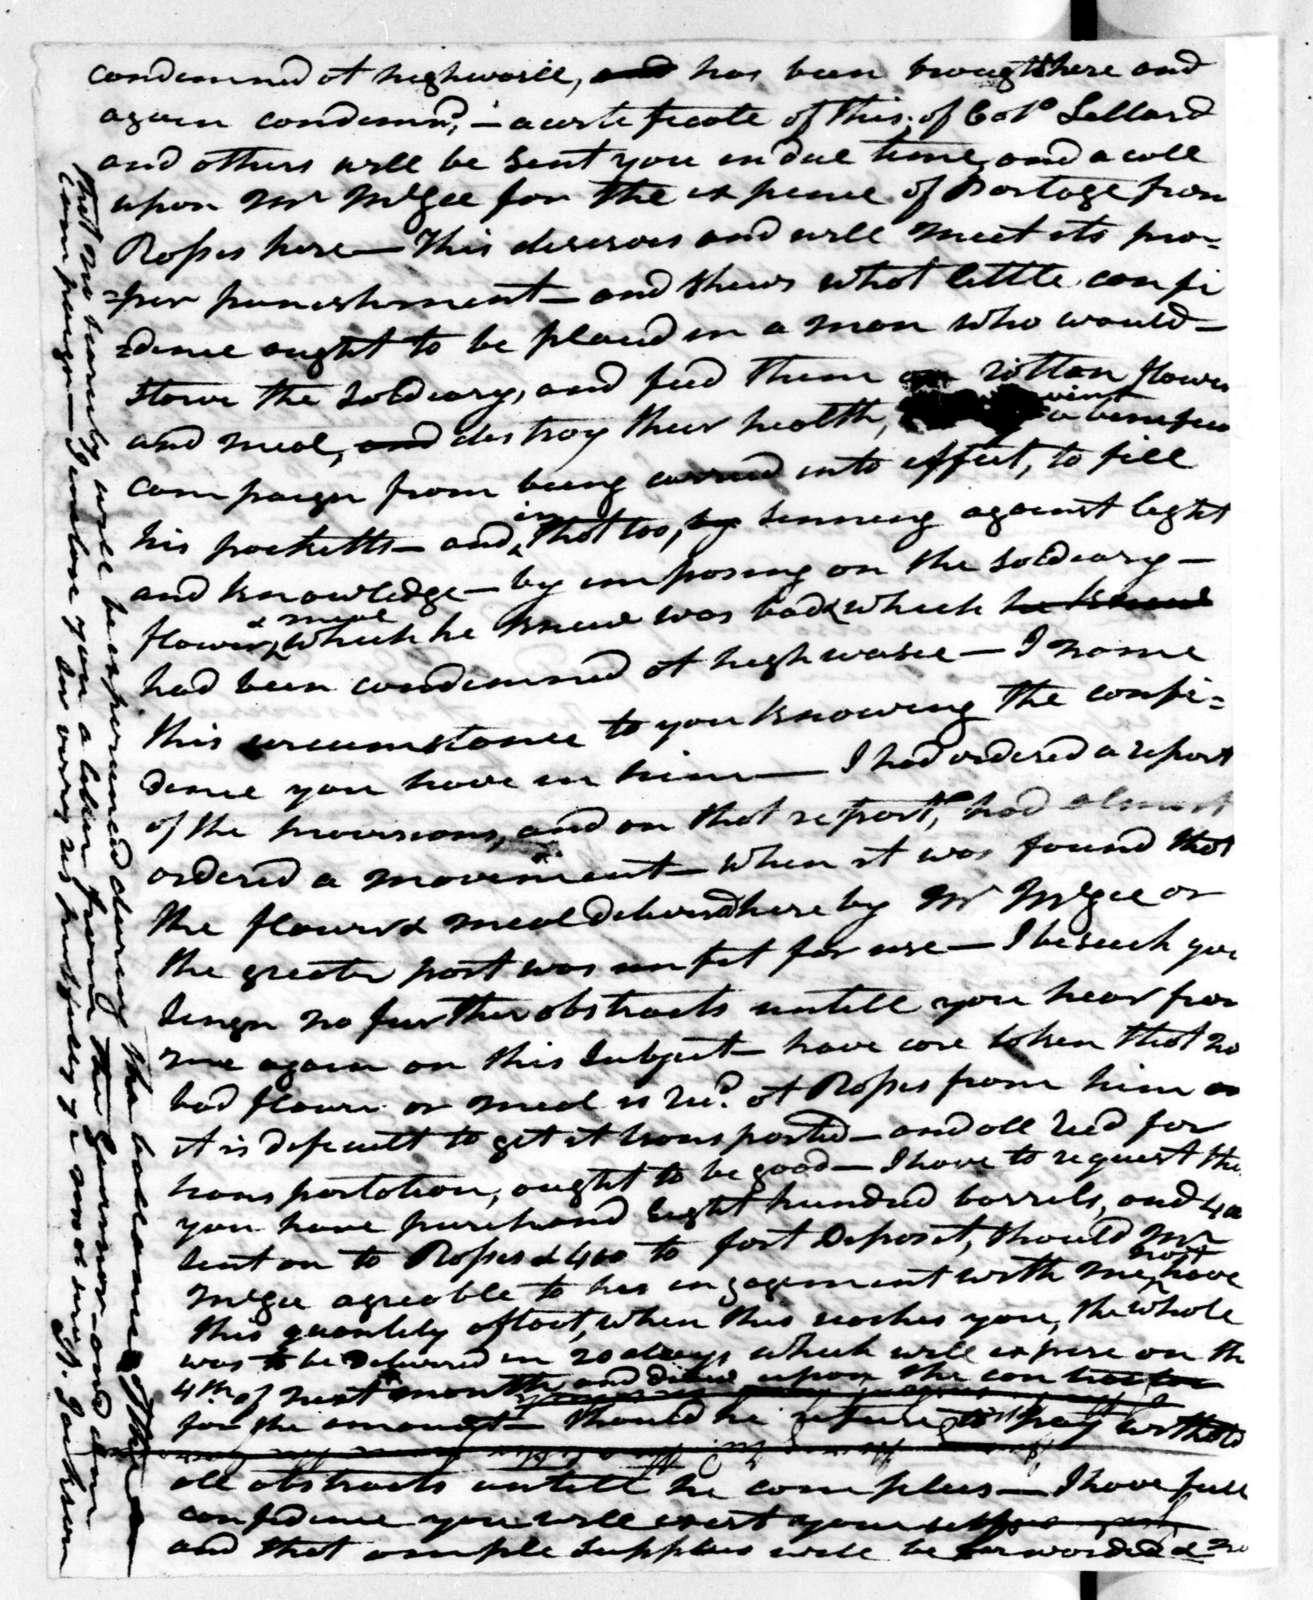 Andrew Jackson to John Cocke